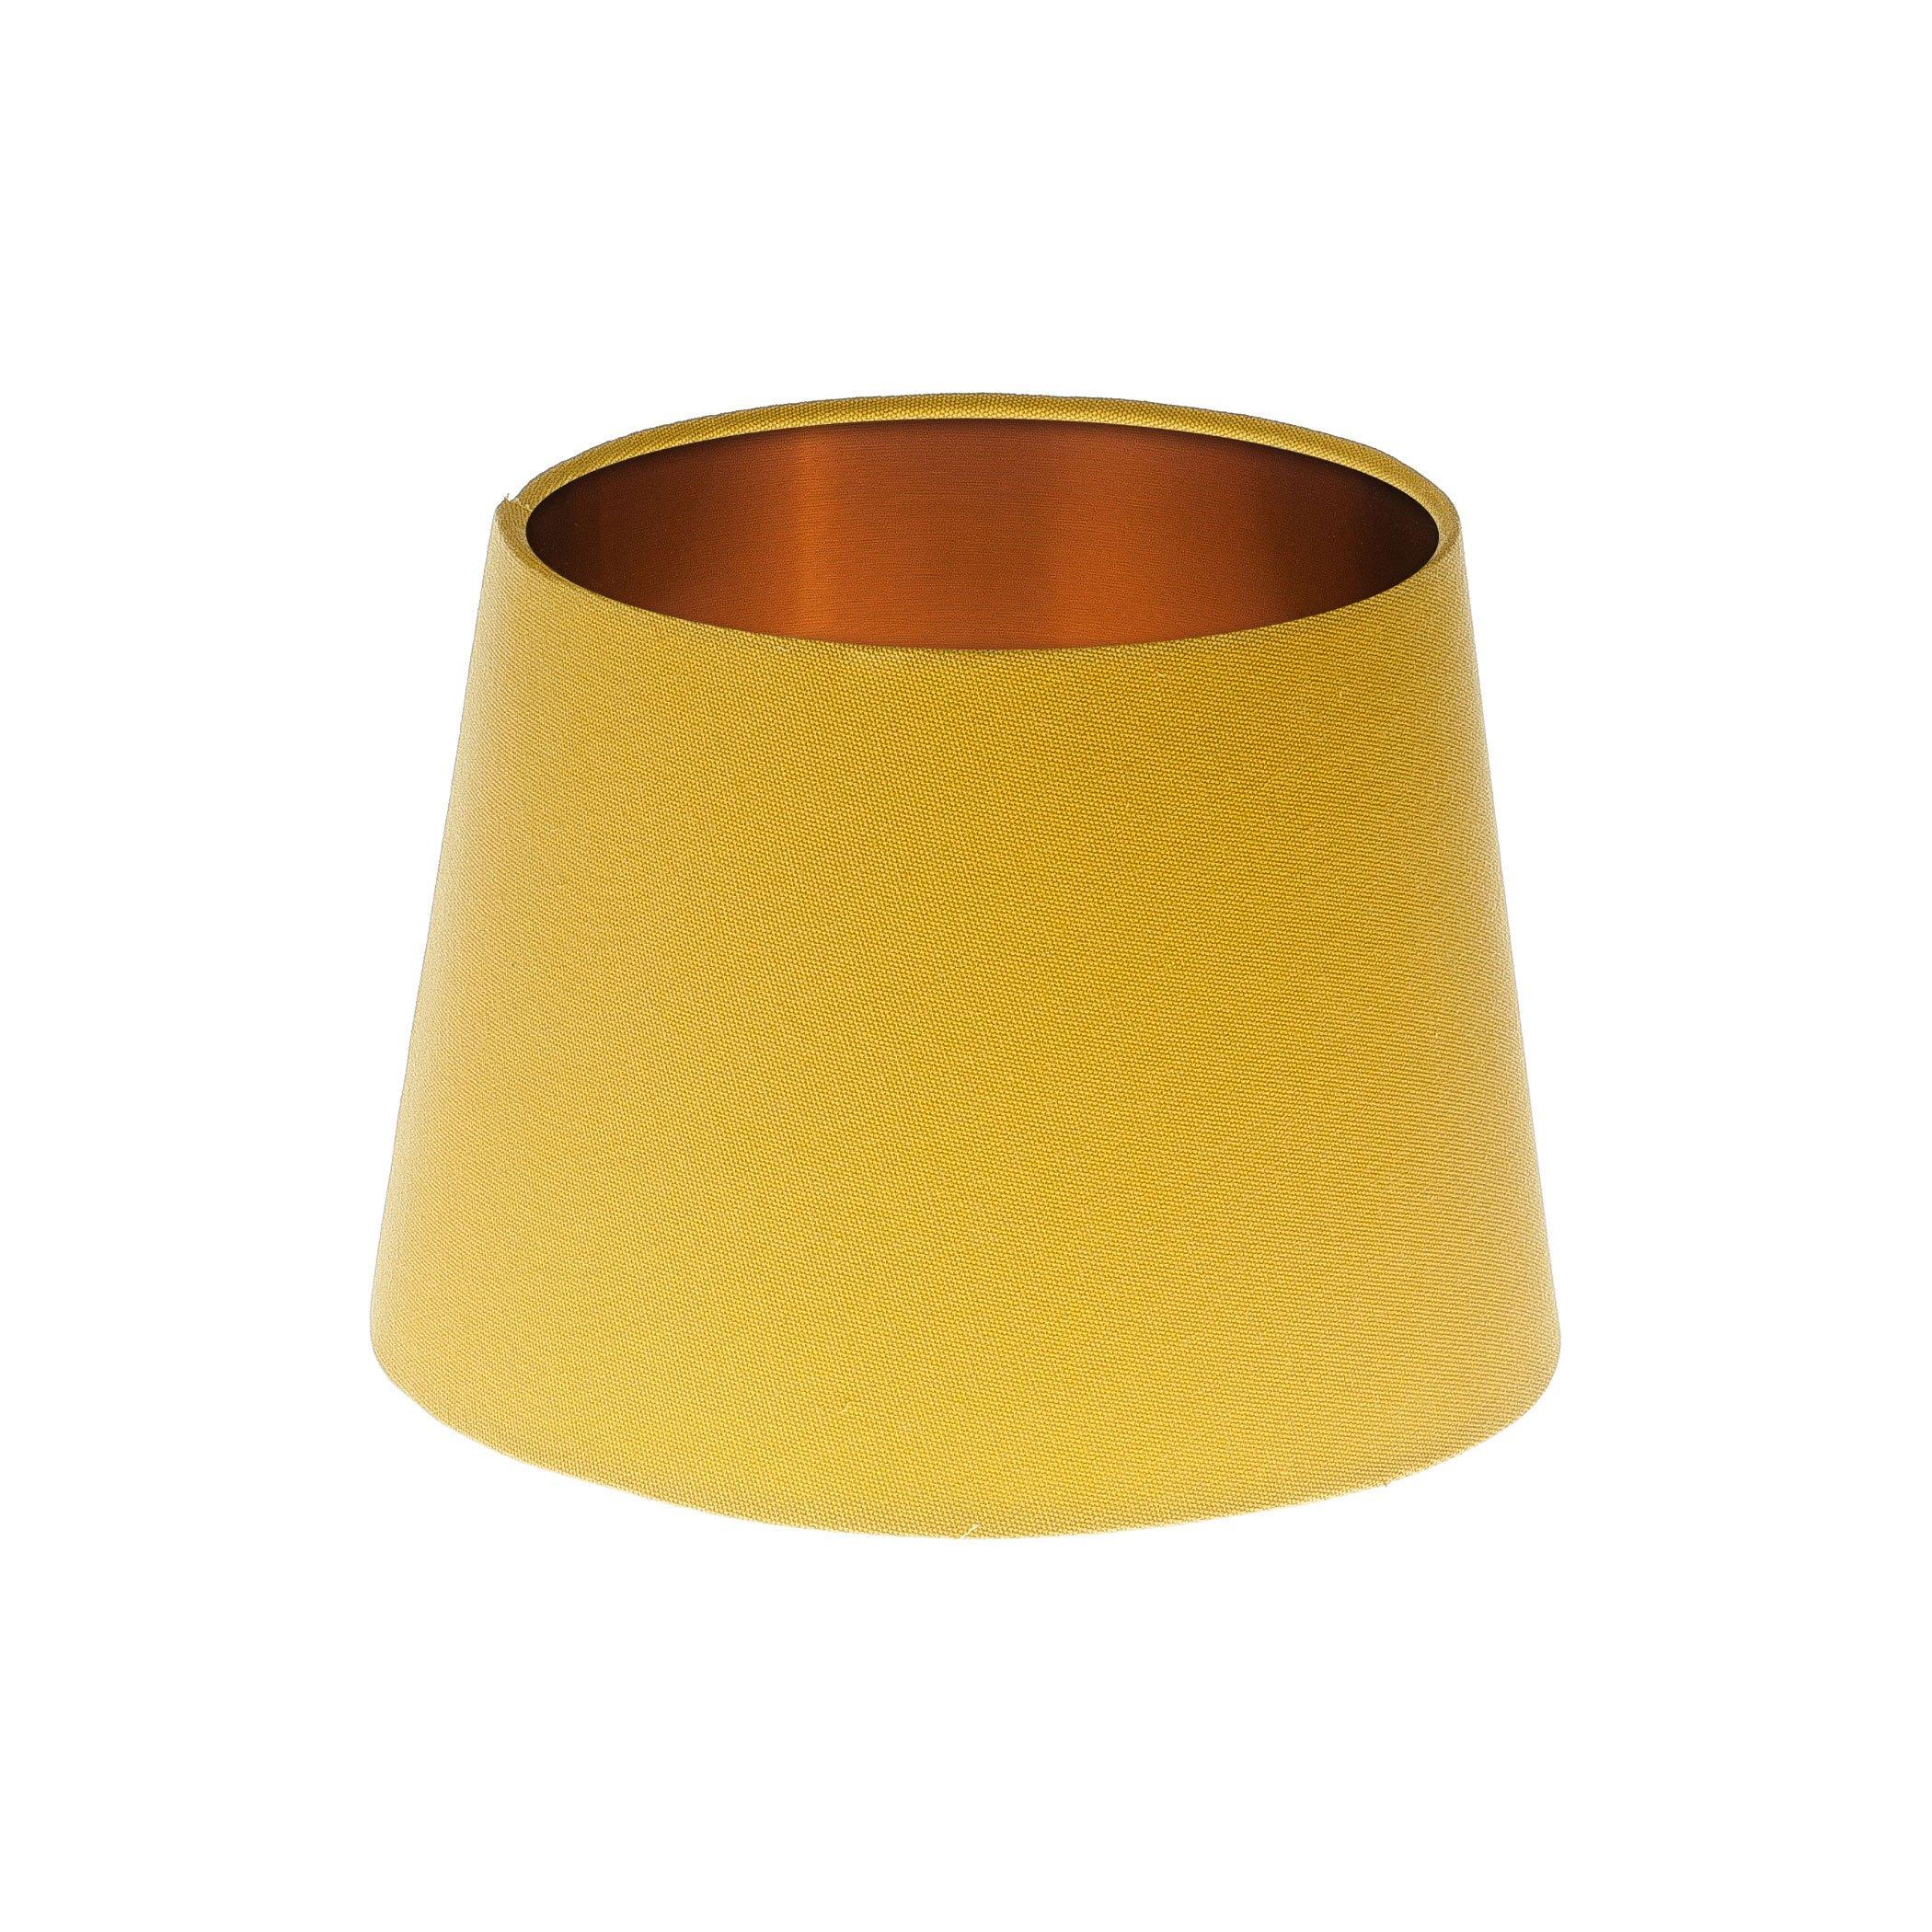 Light Beige Drum Lampshade Brushed Copper Inner 20cm 25cm 30cm 35cm 40cm 50cm 60cm 70cm Lamp Shade Lightshade Lamps